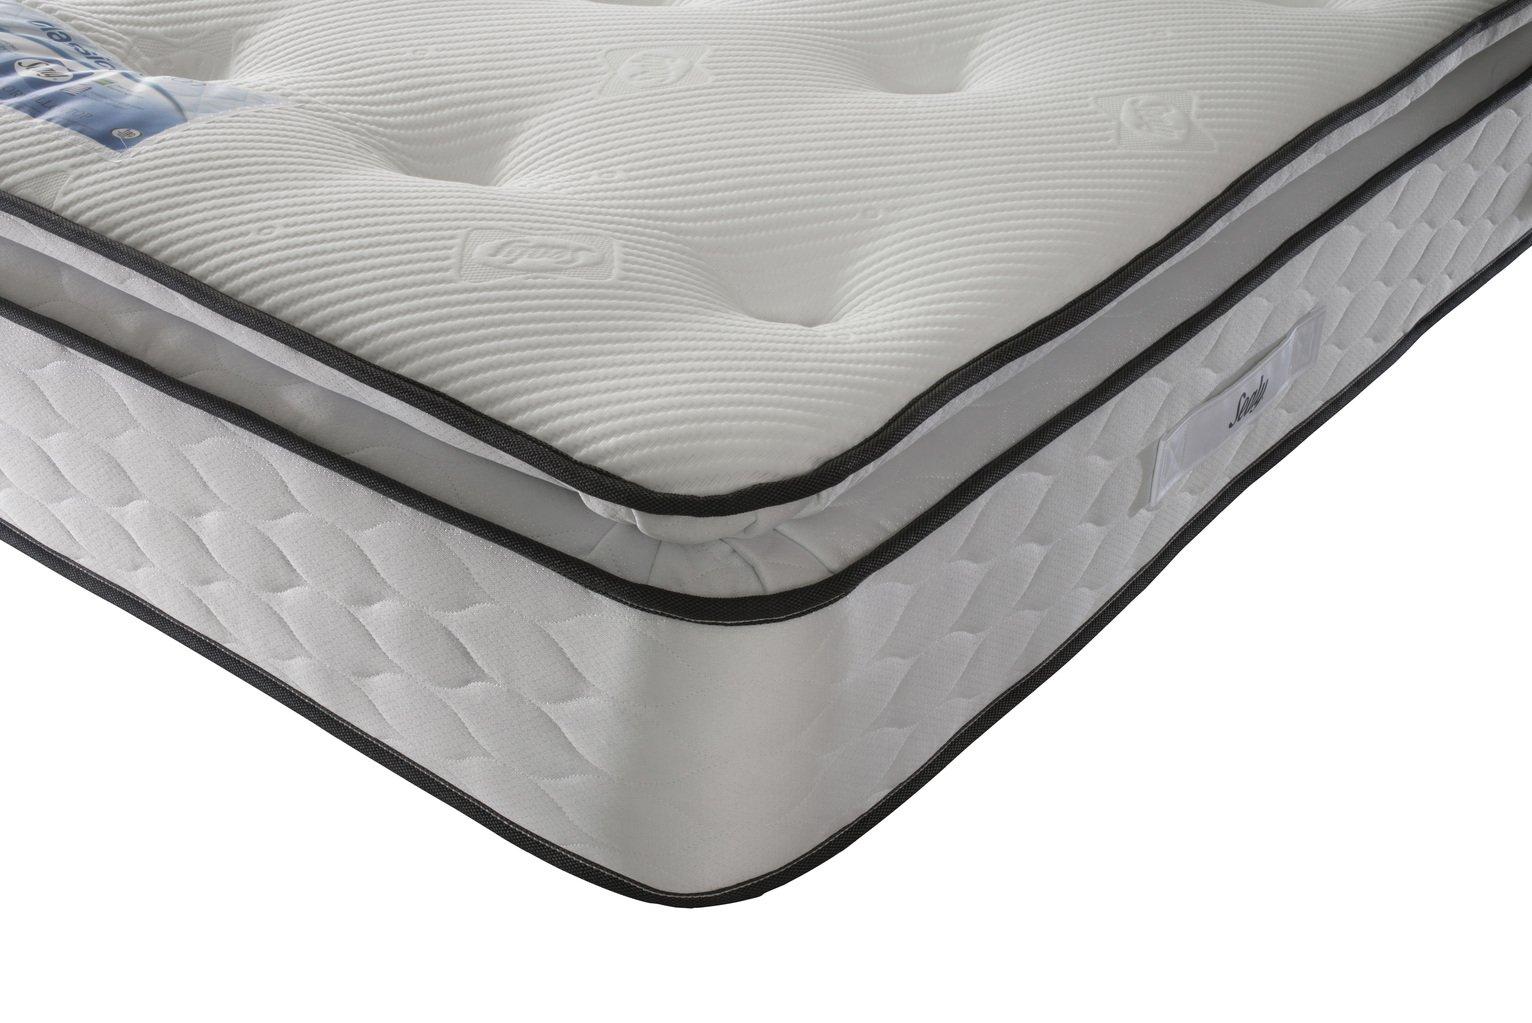 Sealy 1400 Pocket Sprung Pillowtop Memory Kingsize Mattress